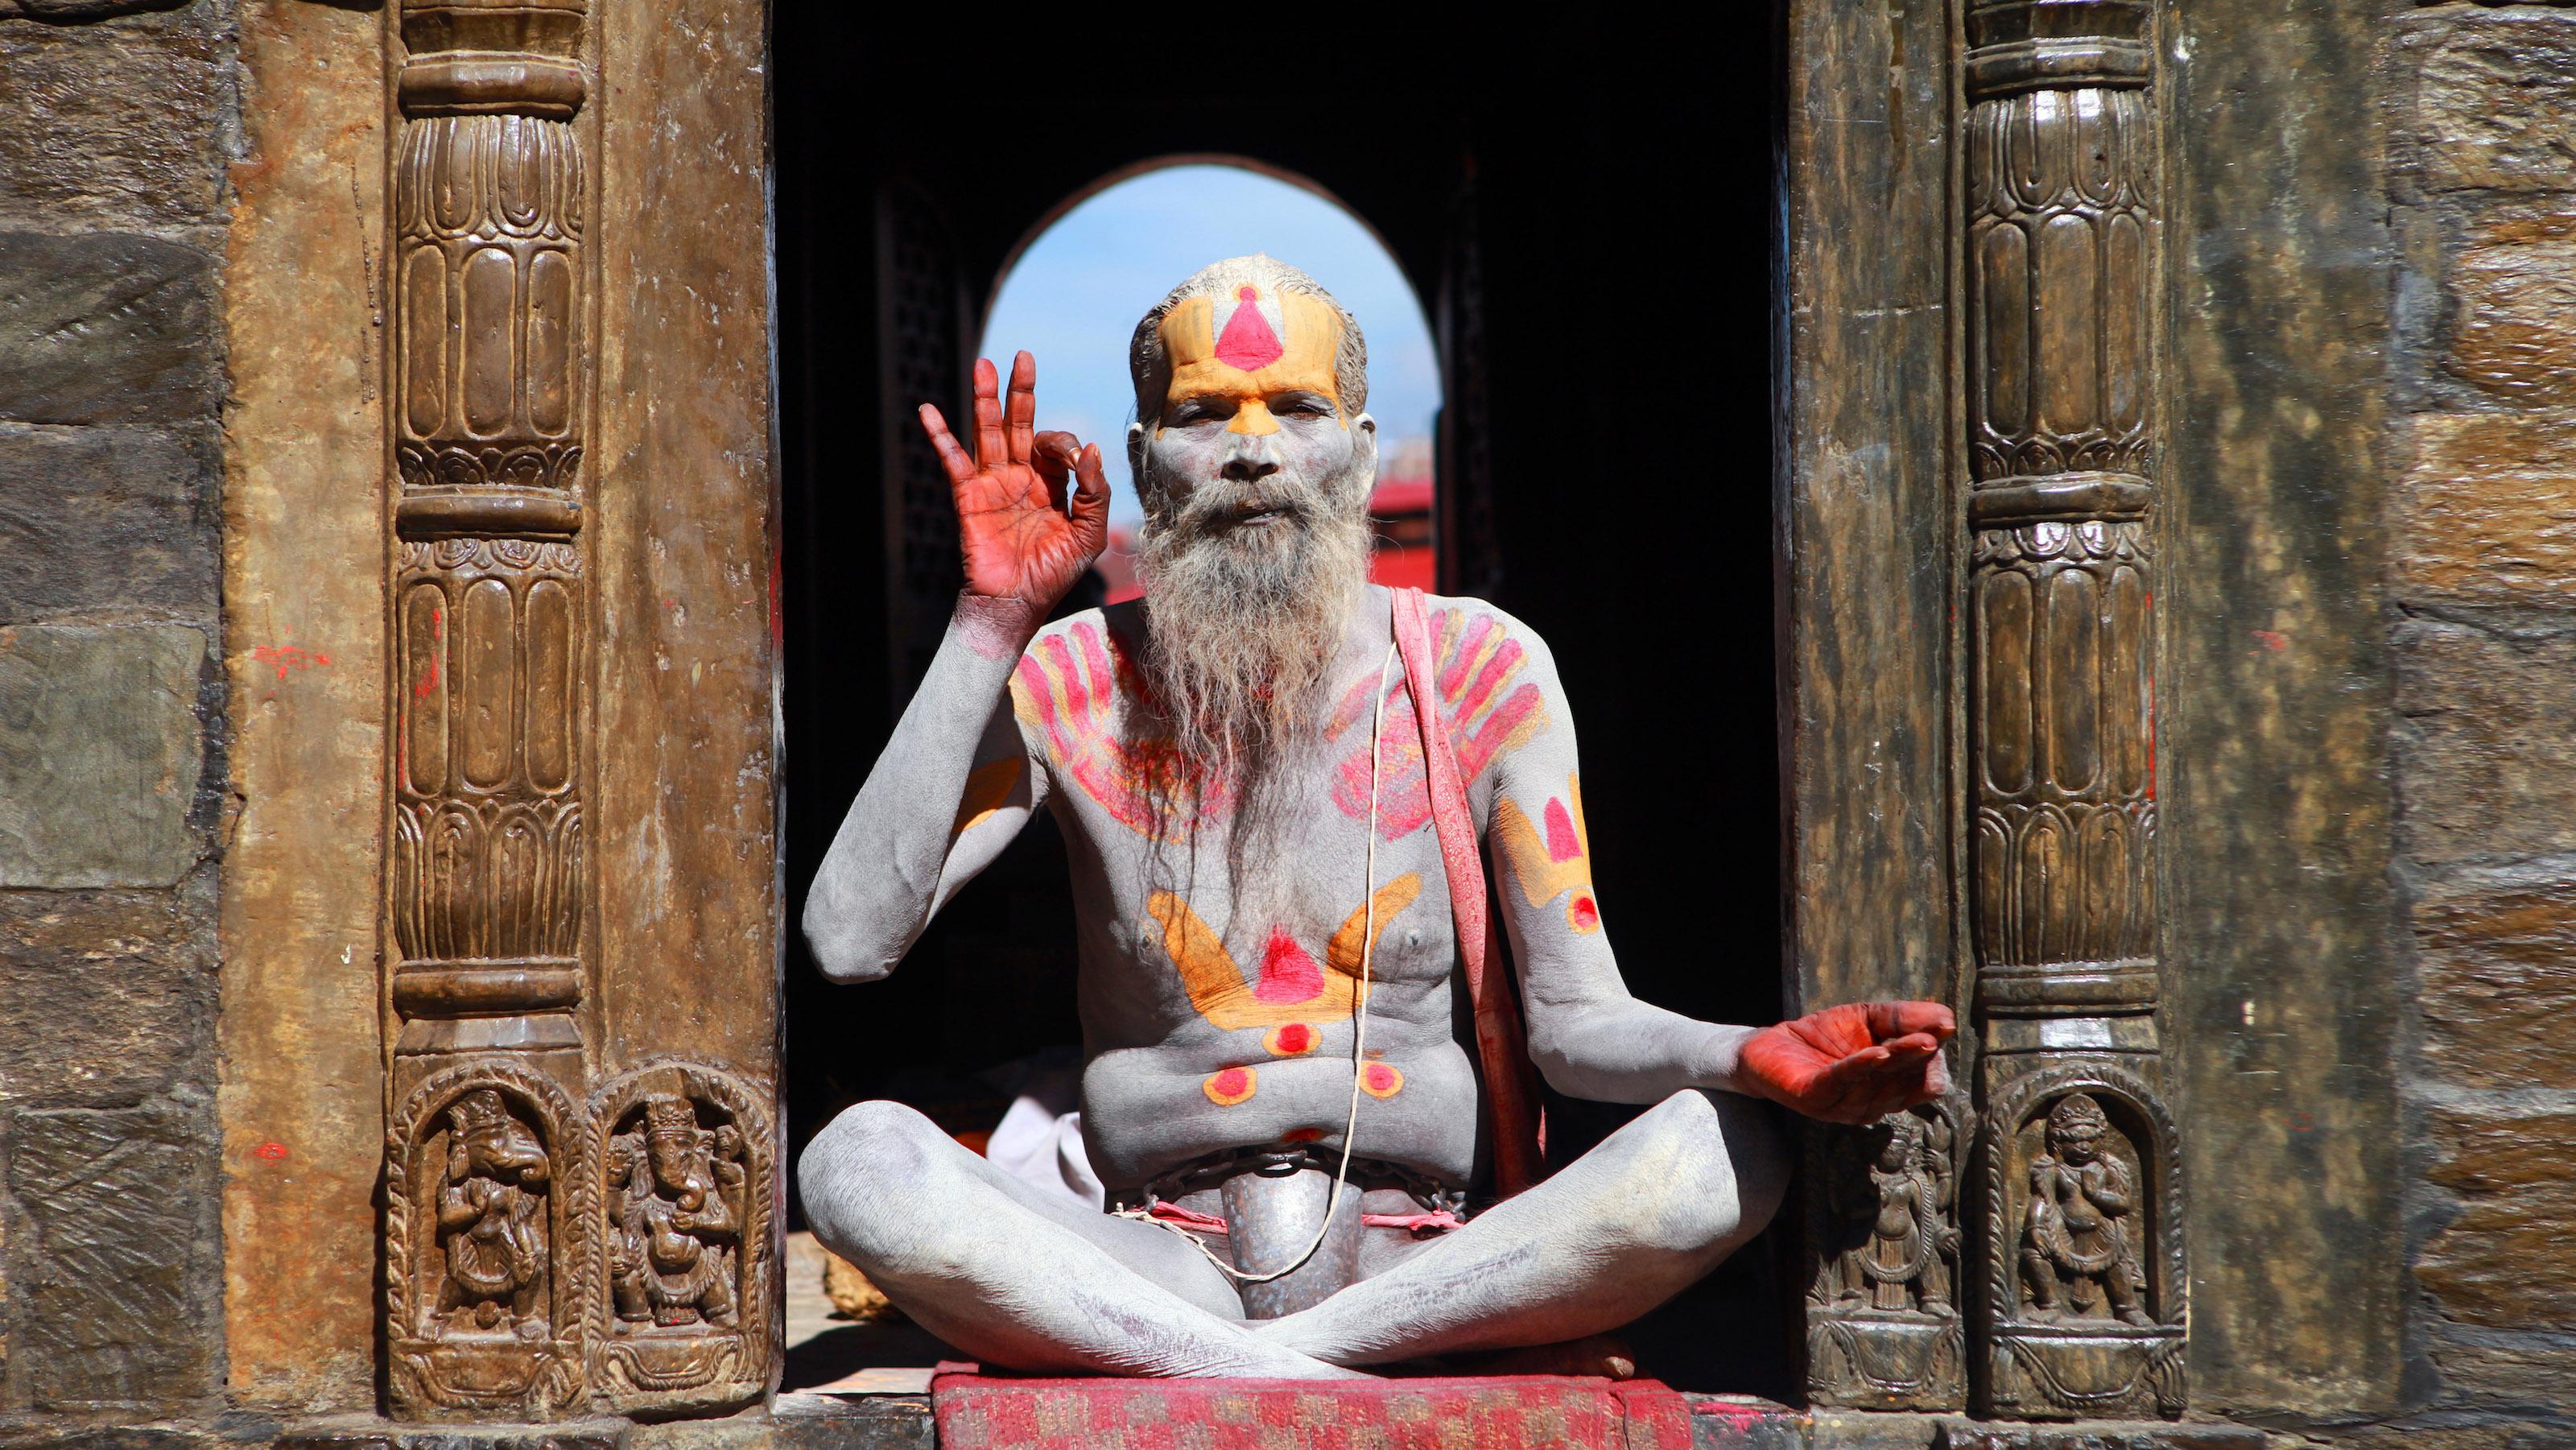 Copia-di-shaman-in-kathmandu-nepal